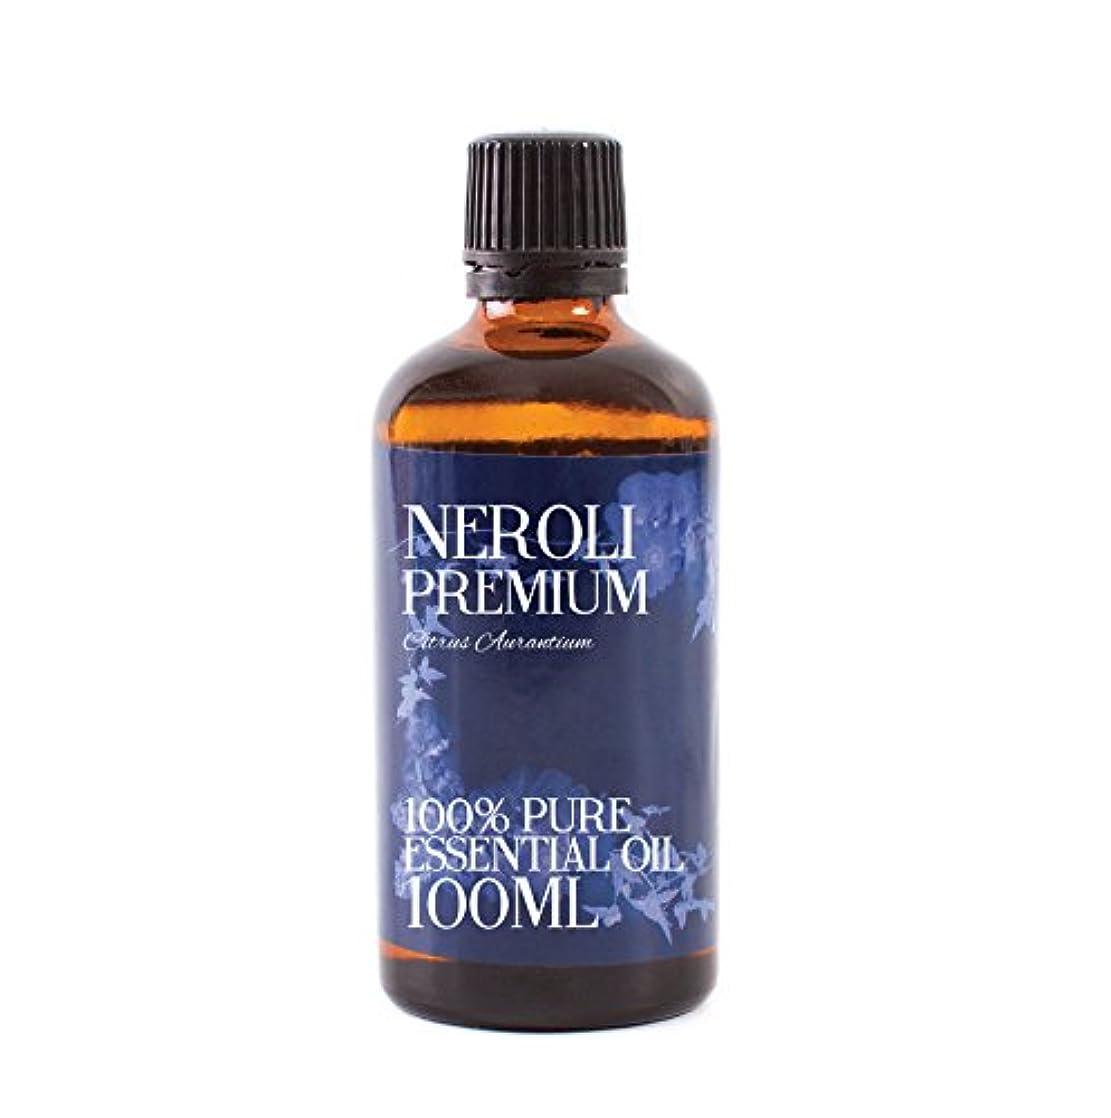 Mystic Moments | Neroli Premium Essential Oil - 100ml - 100% Pure